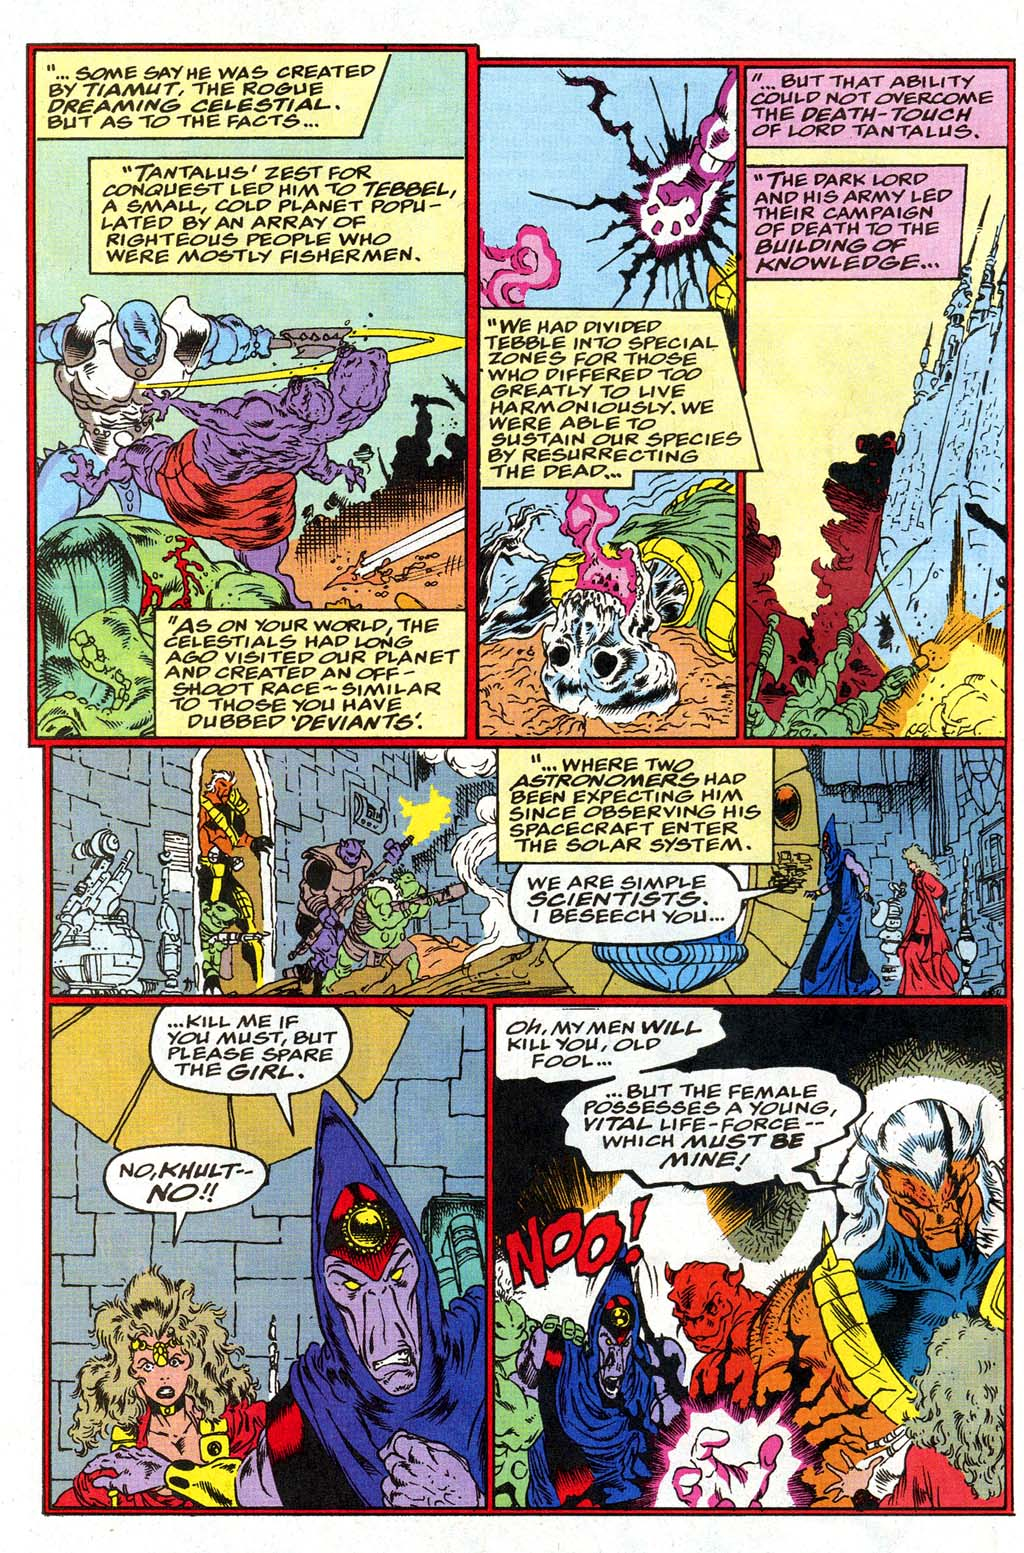 Read online Blackwulf comic -  Issue #9 - 13